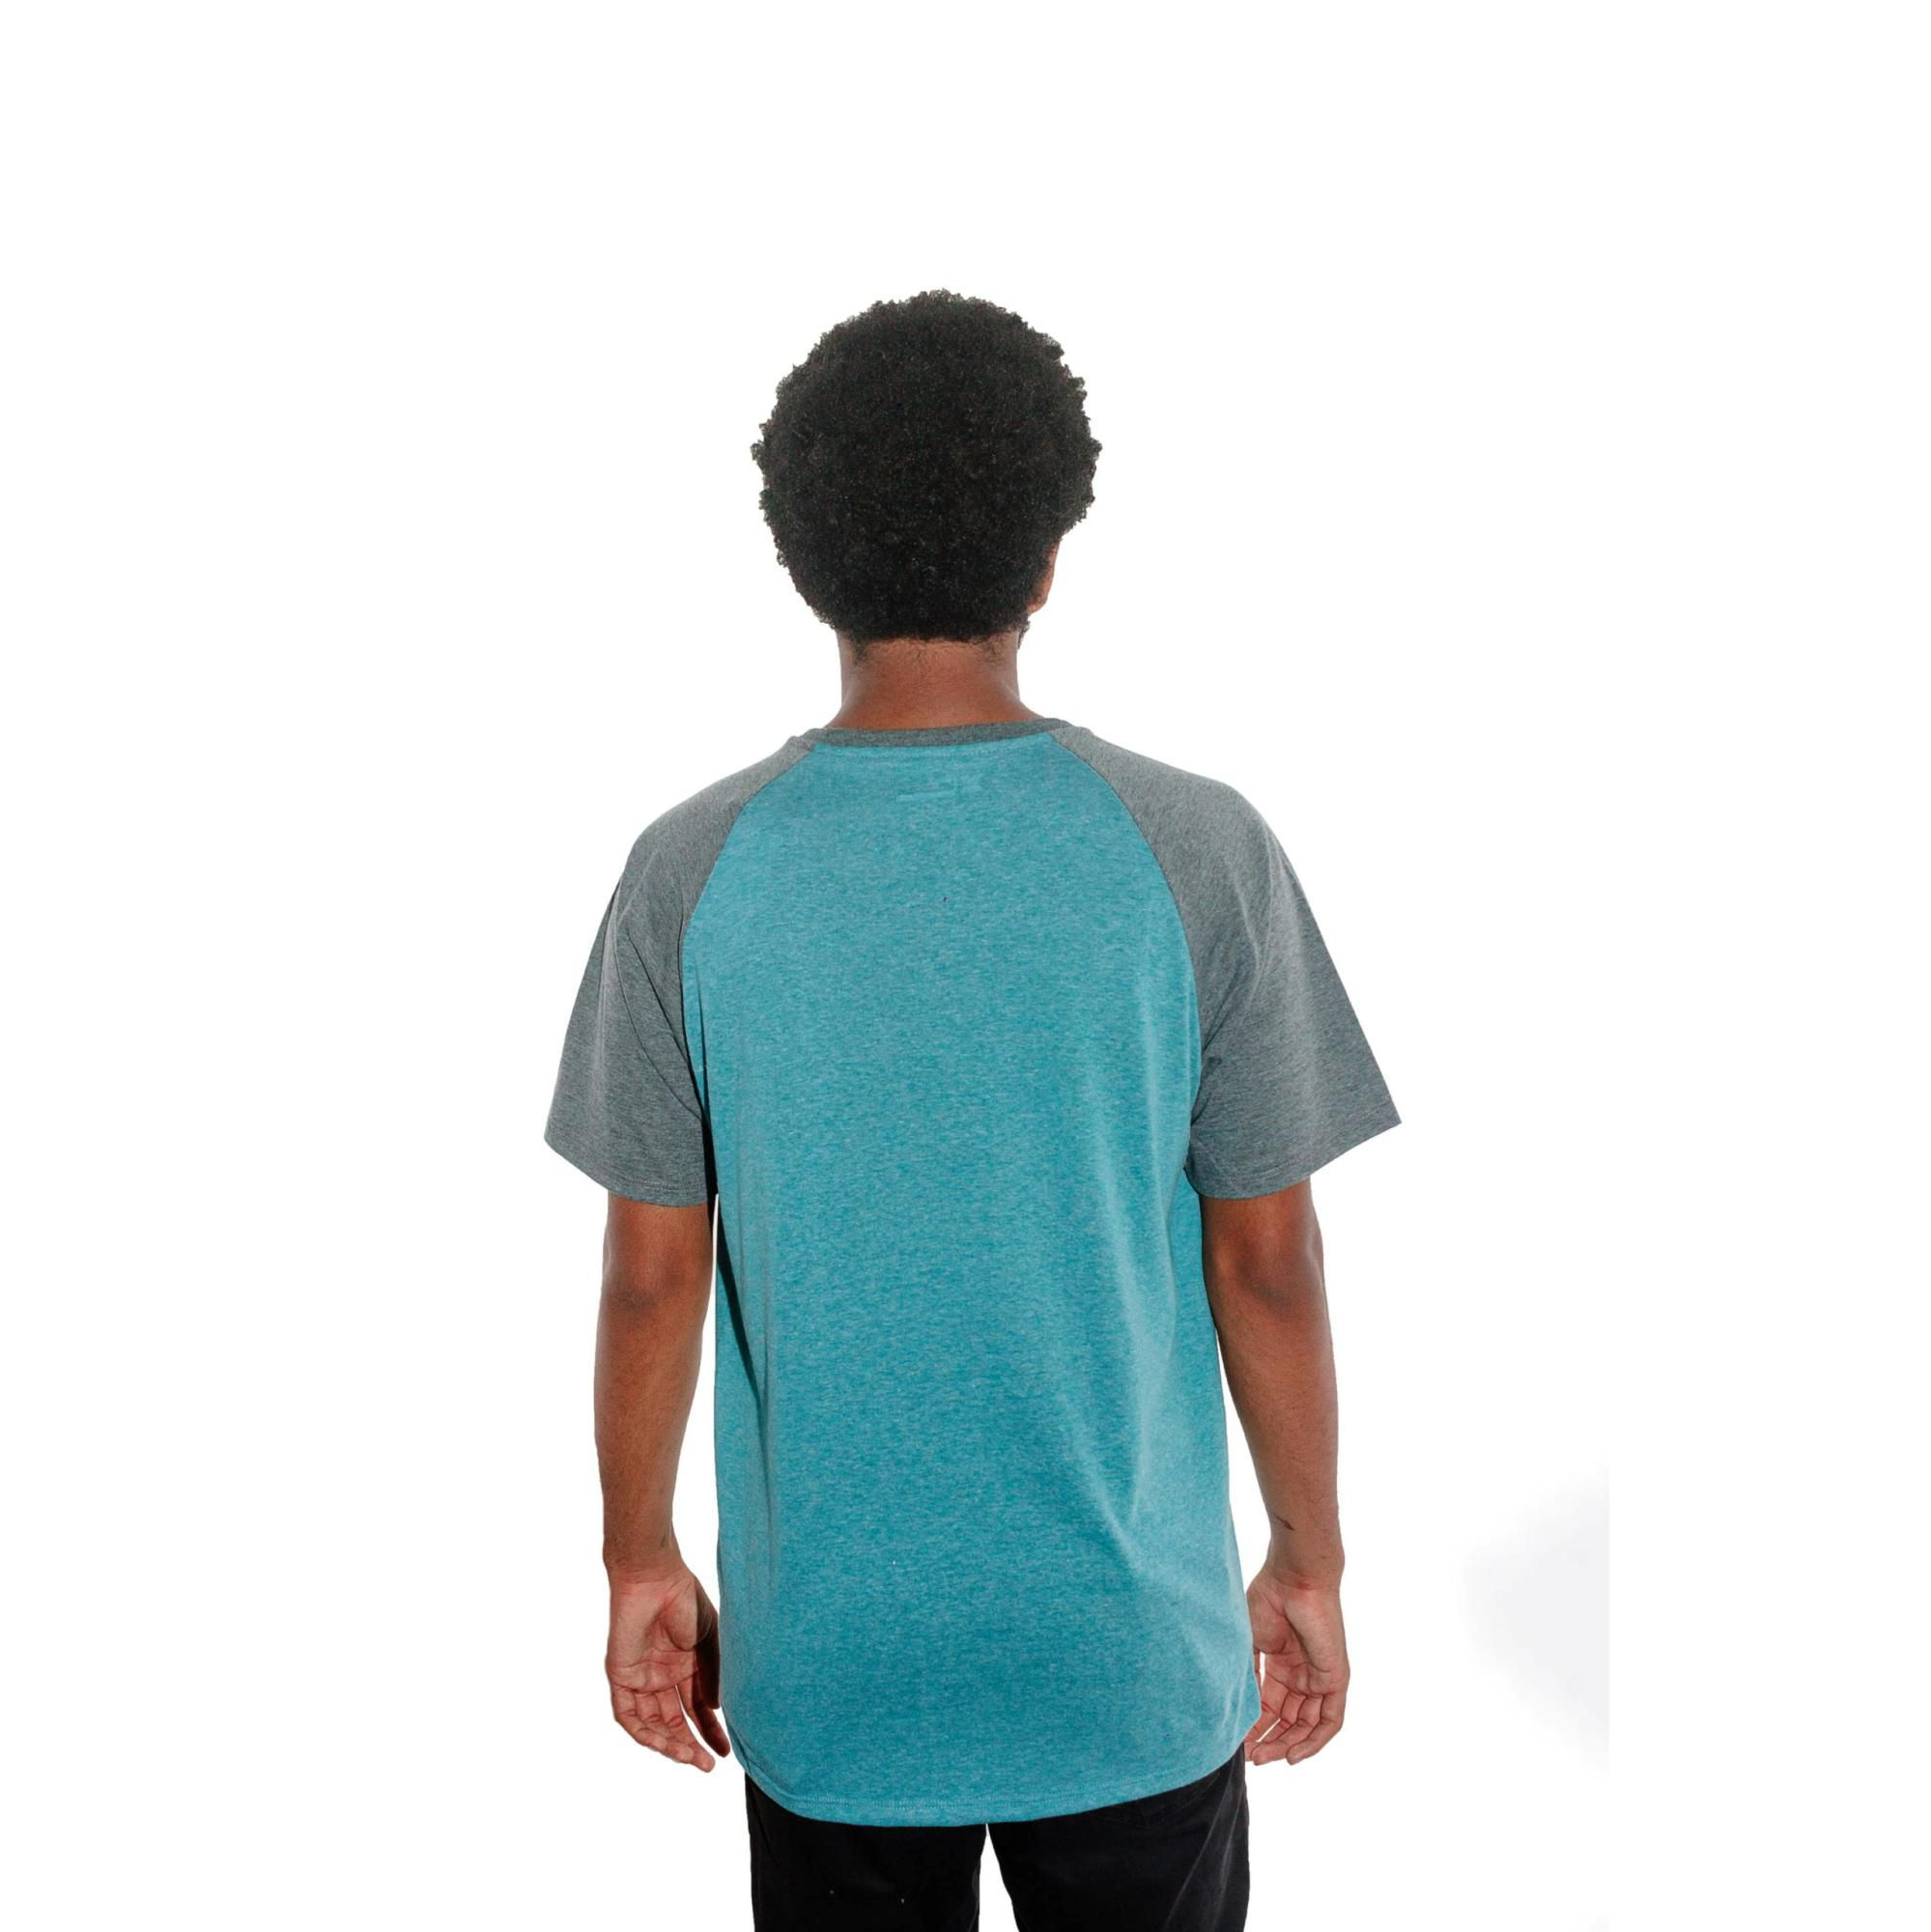 Camiseta Hurley Raglan Azul Mescla